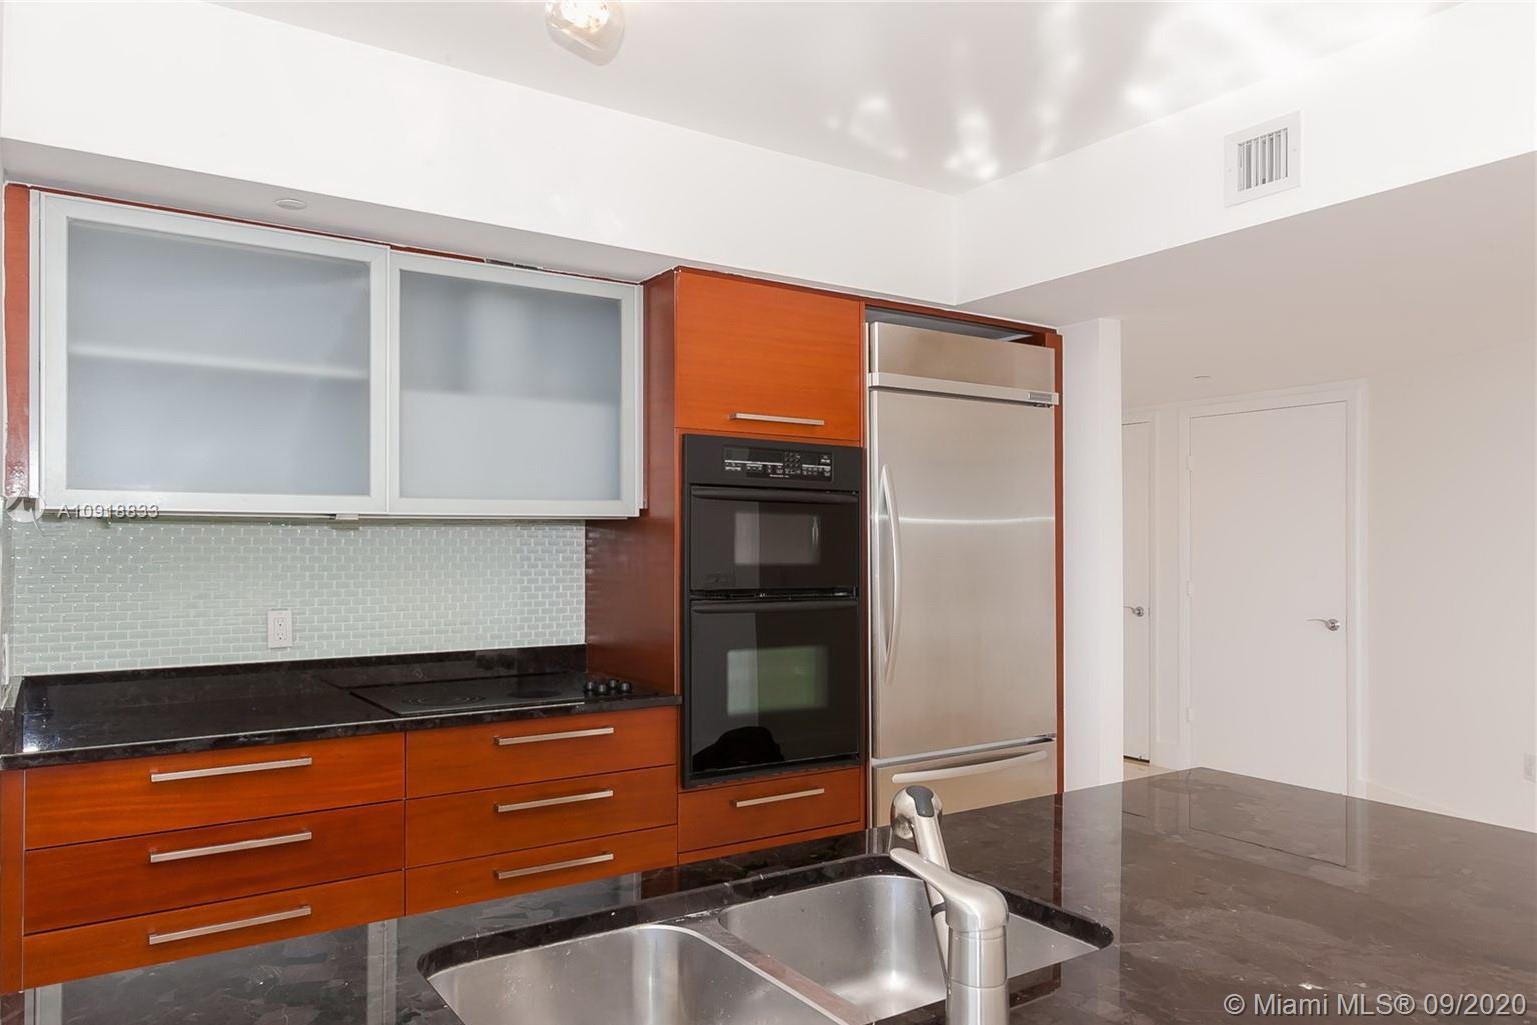 1606 2 / 2 1458 sq. ft. $ 2021-01-25 0 Photo